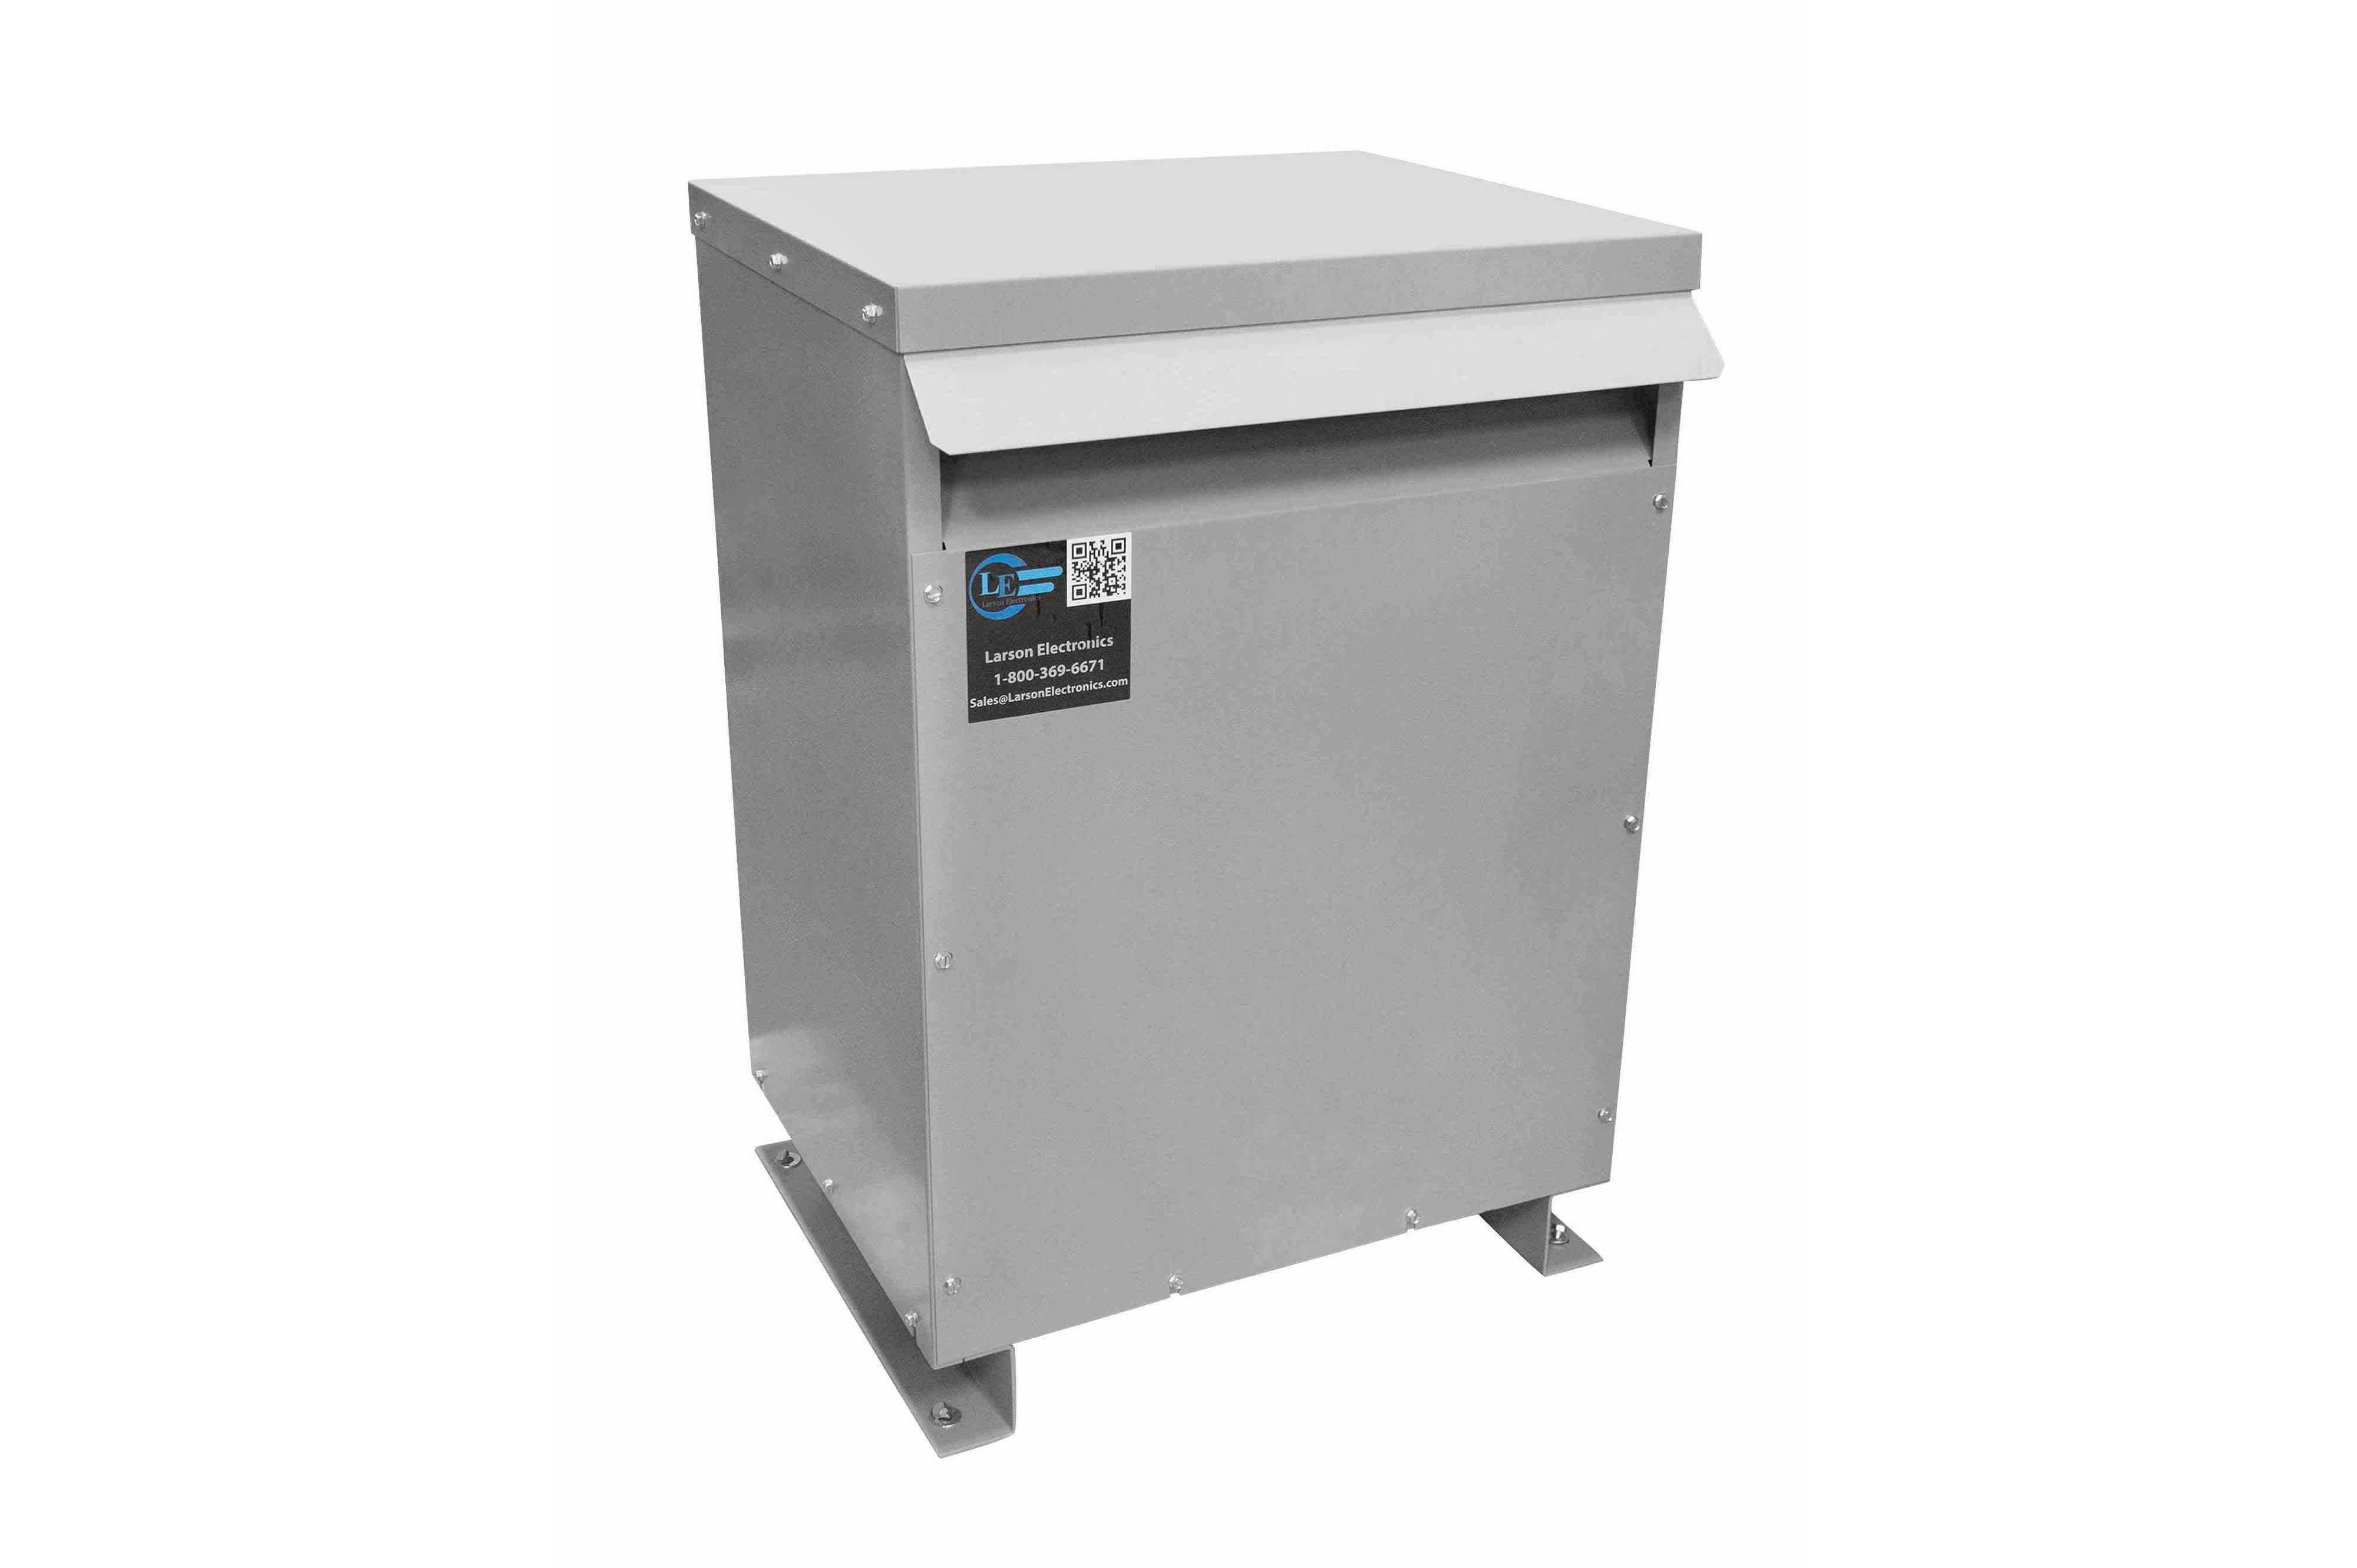 150 kVA 3PH Isolation Transformer, 380V Wye Primary, 600V Delta Secondary, N3R, Ventilated, 60 Hz